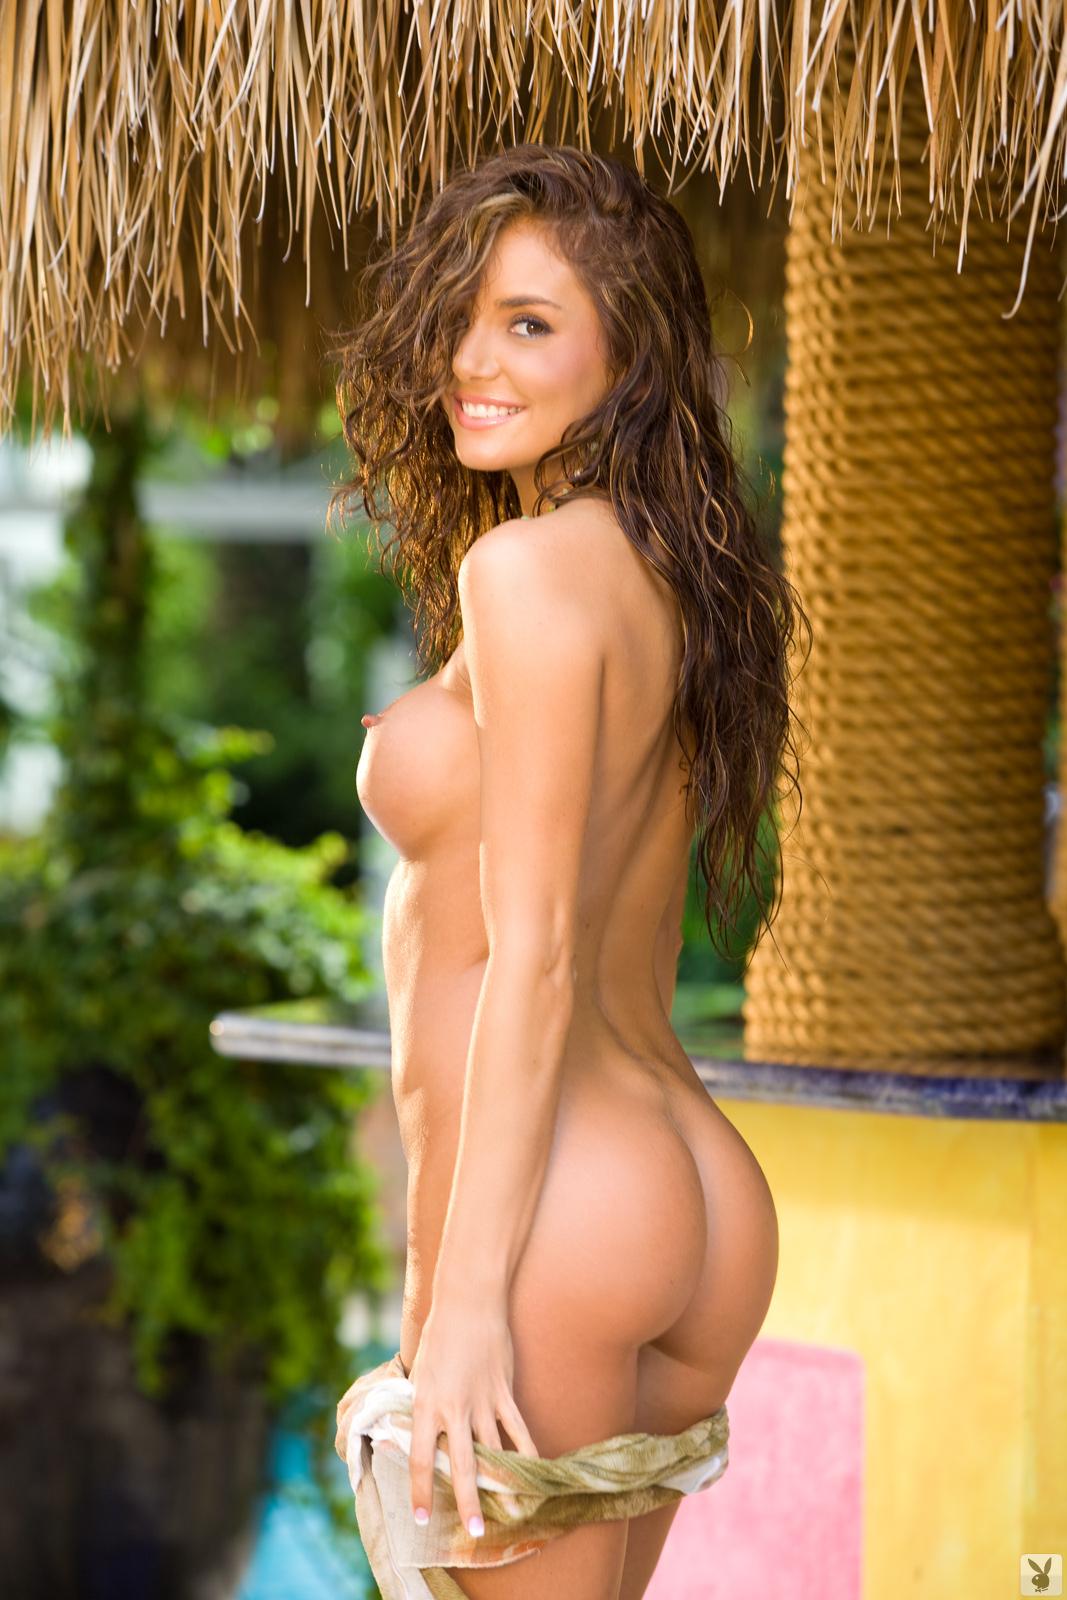 Hillary fisher nude pics, bukkake japanese mpeg